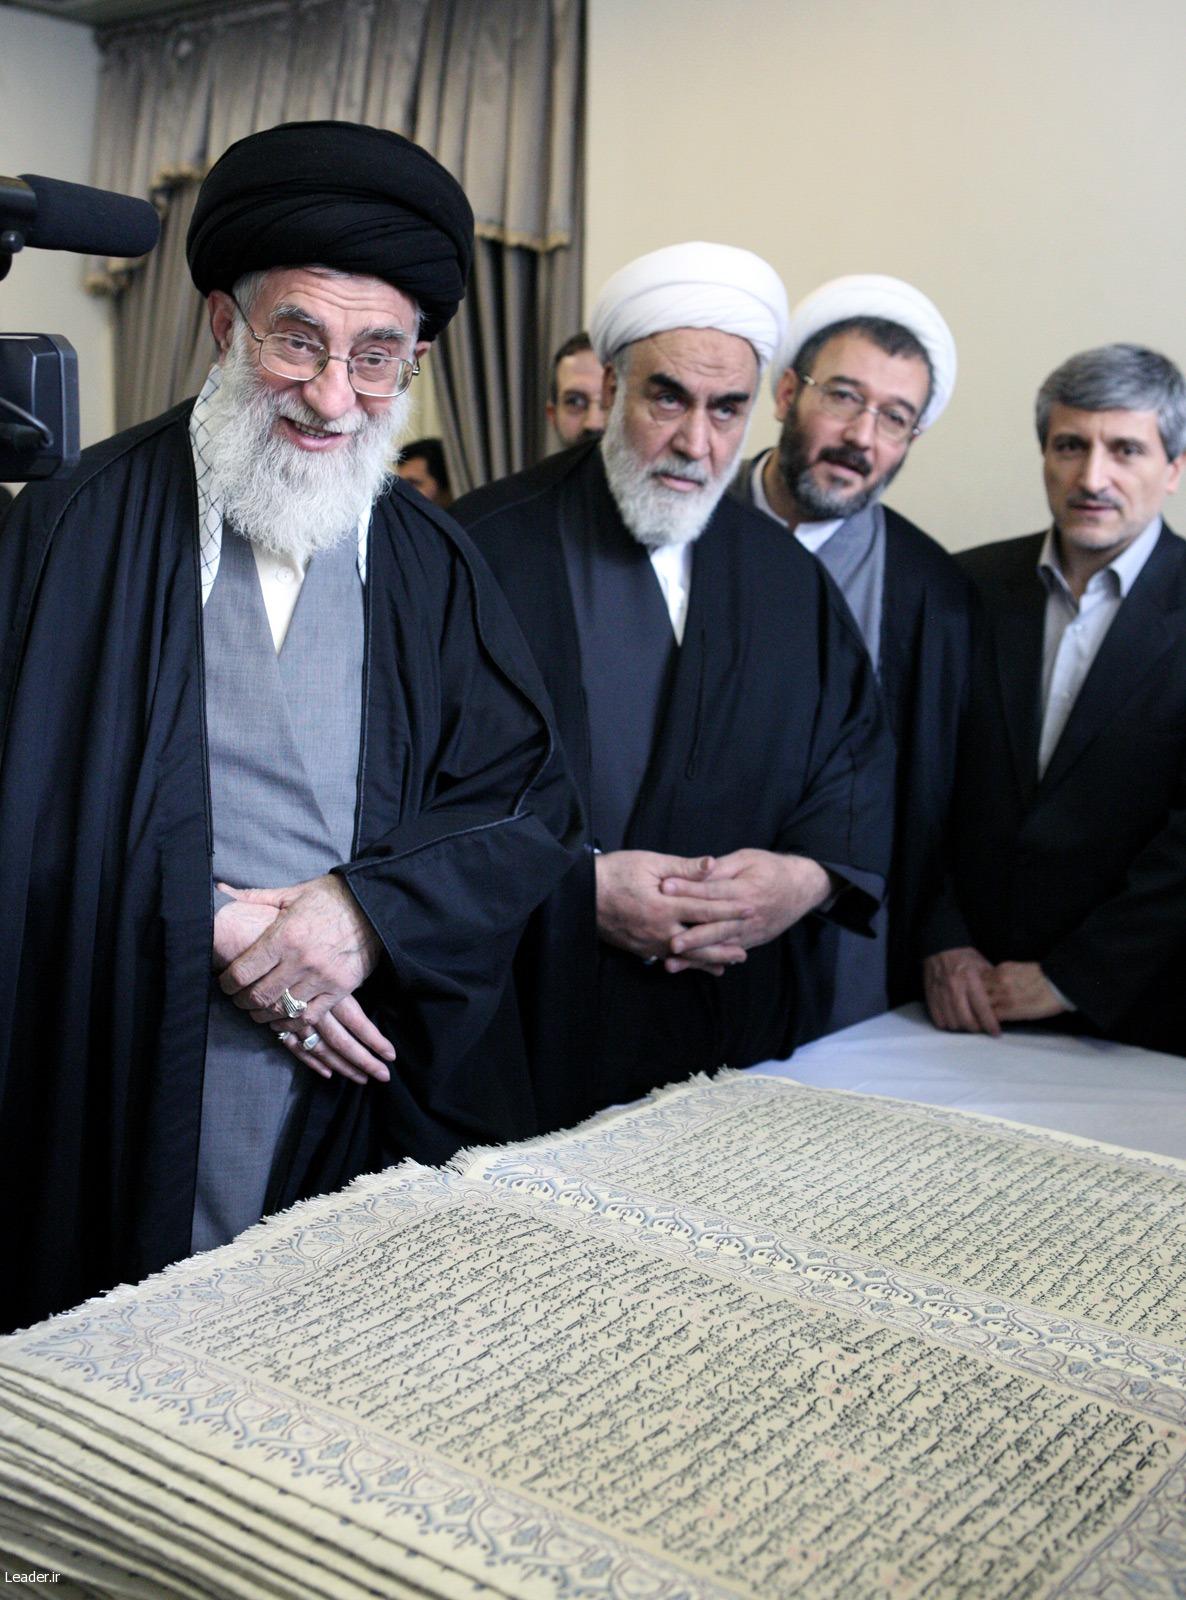 khamenei.ir حضرت آيتالله خامنهای اين فرش قرآنی نفيس را افتخاری ماندگار و يادگاری بسيار عظيم برای نظام جمهوری اسلامی دانستند. ile ilgili görsel sonucu